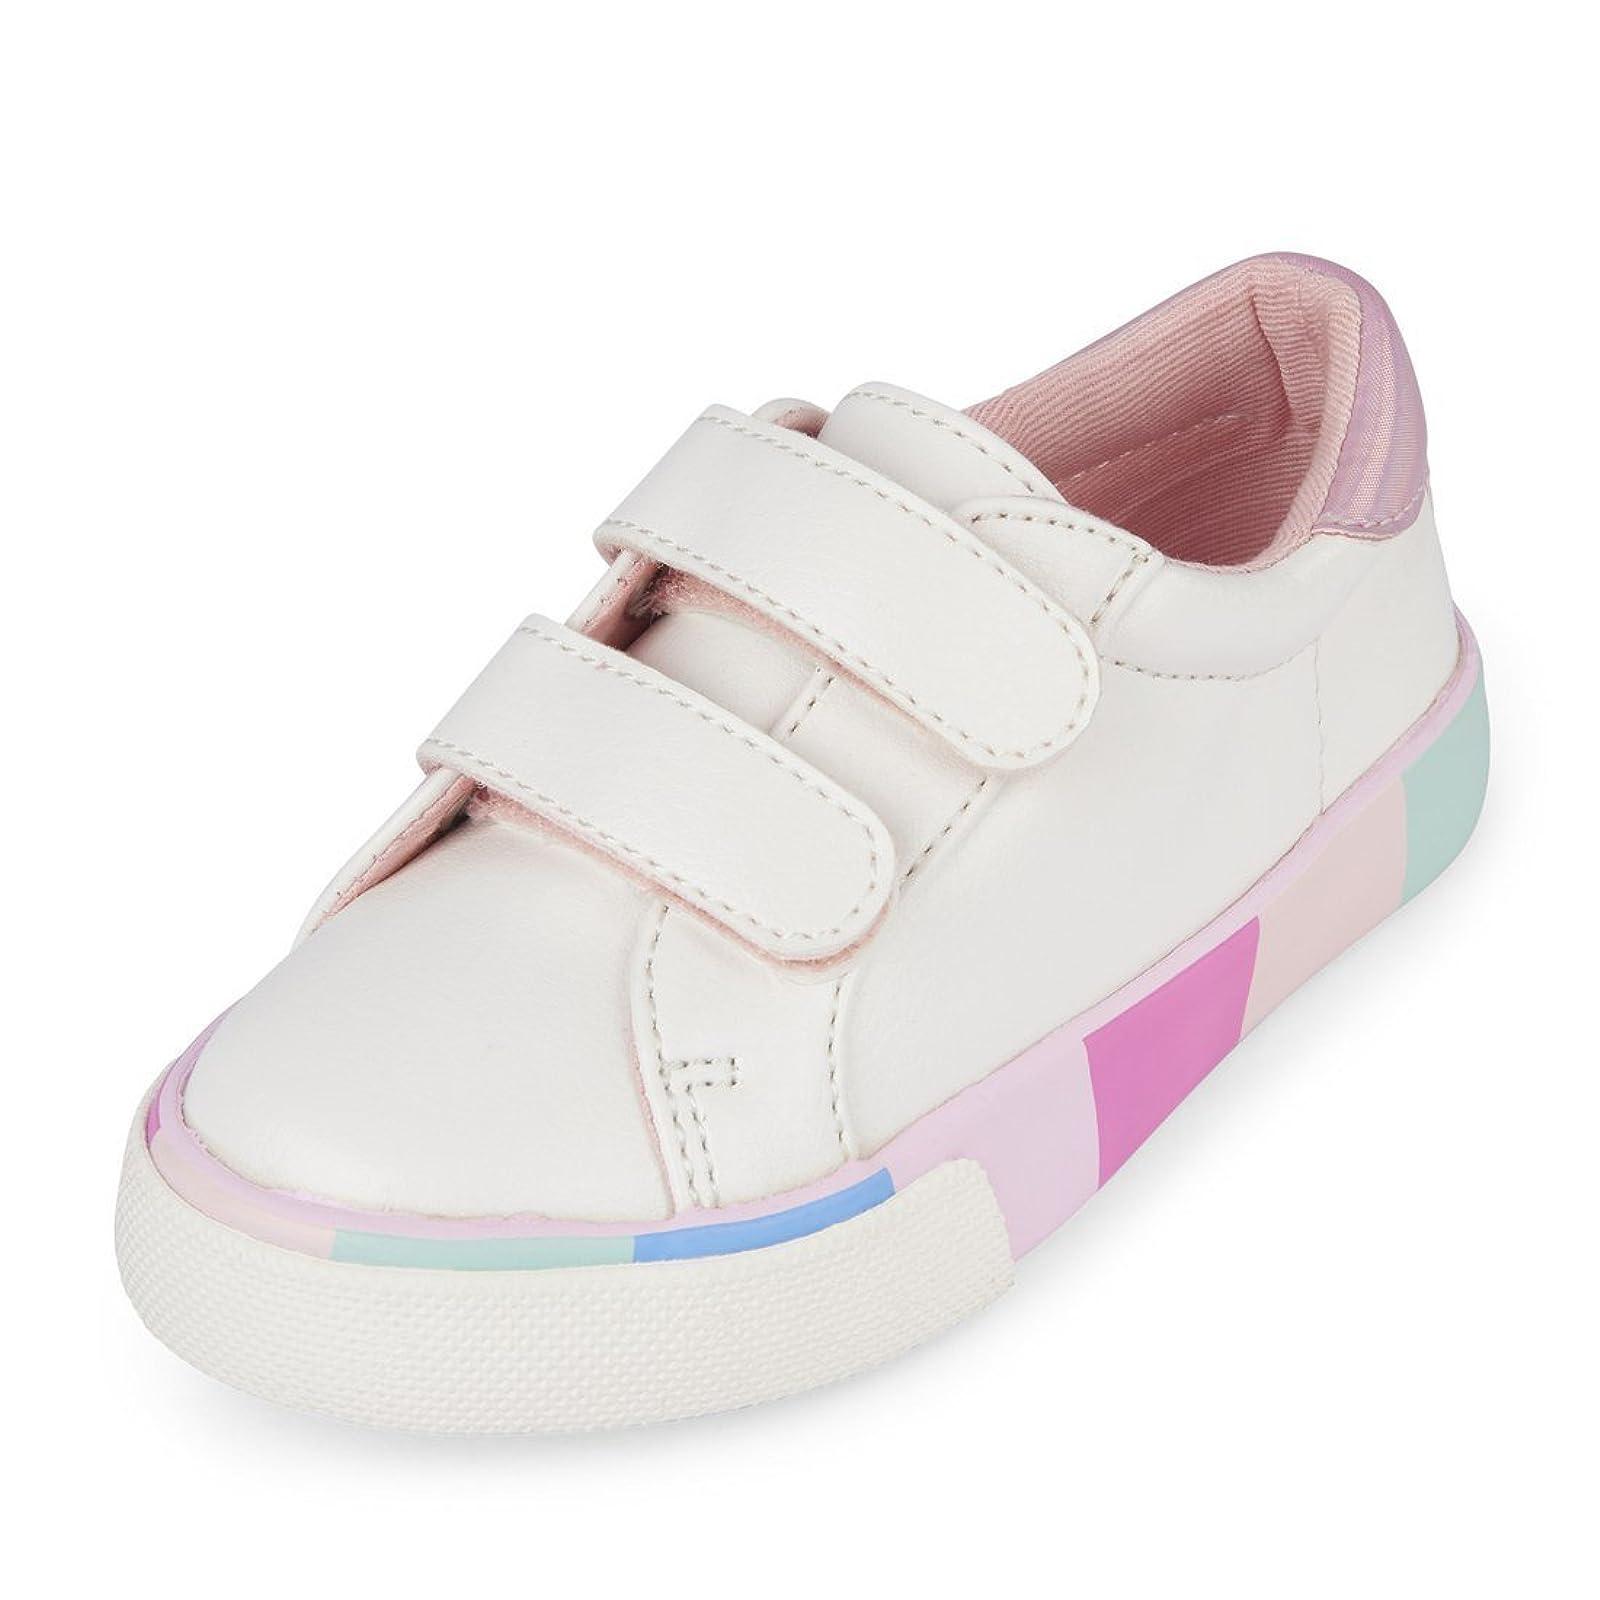 The Children's Place Kids' Tg Multi Sneaker 8 M US - 1